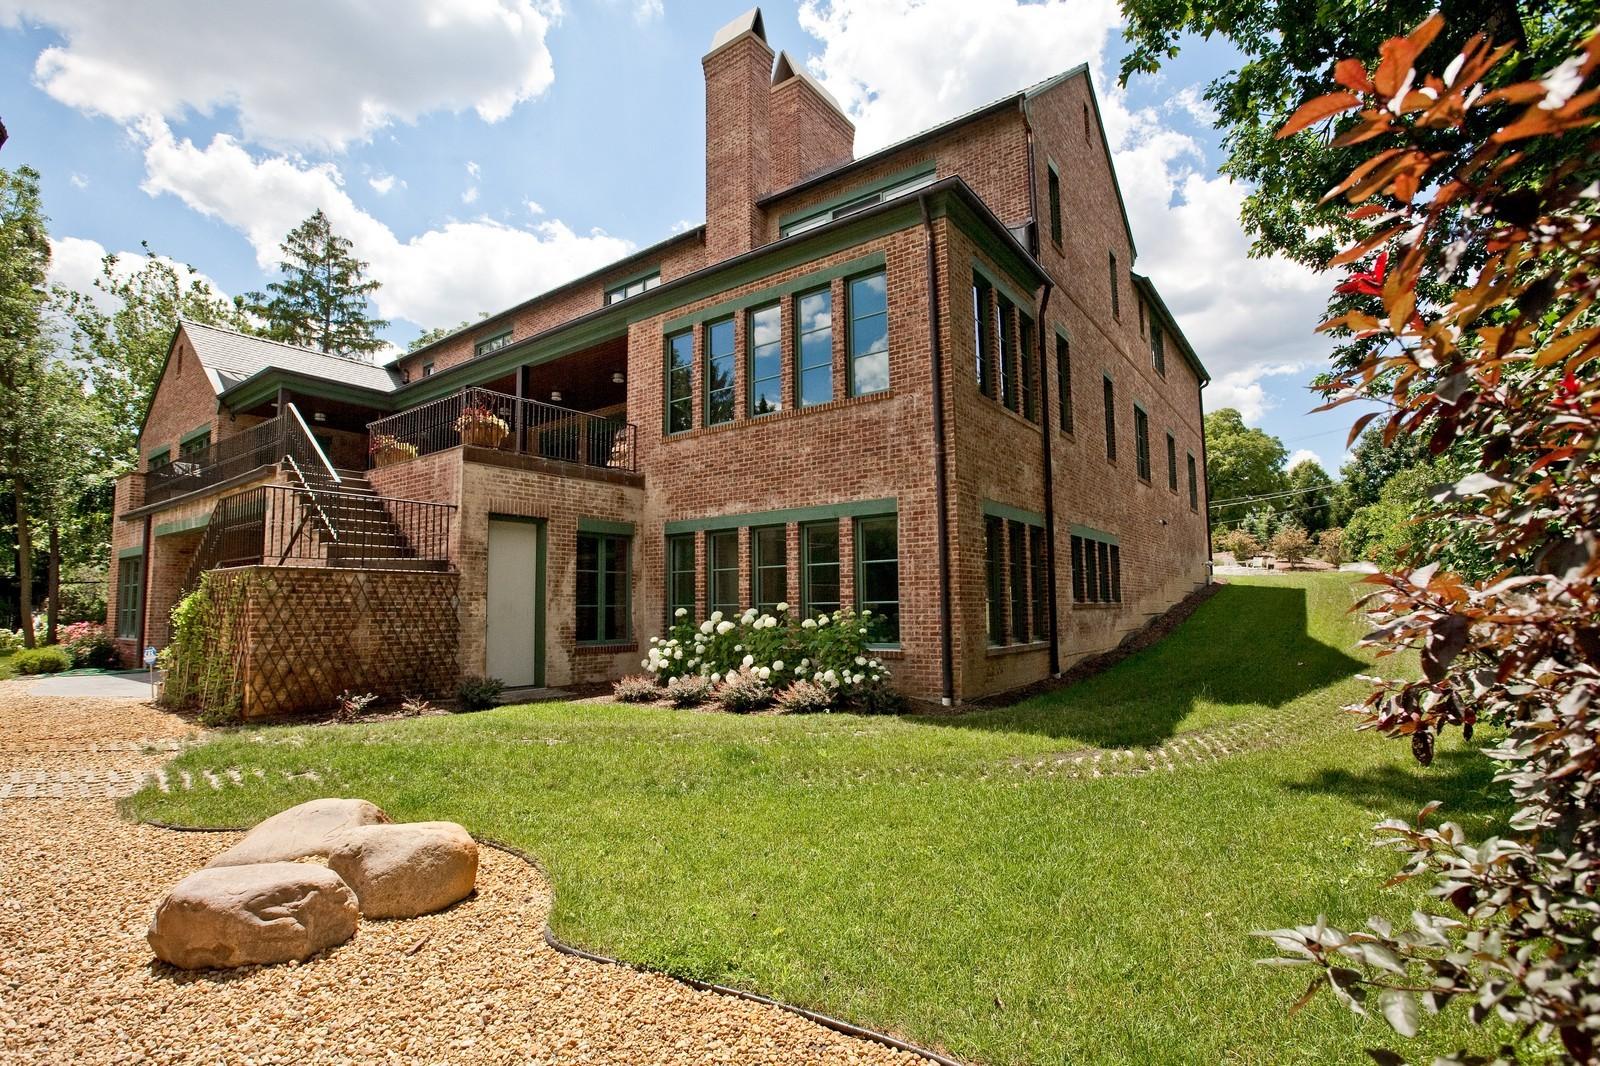 Real Estate Photography - 6143 Madison, Burr Ridge, IL, 60527 - Location 11